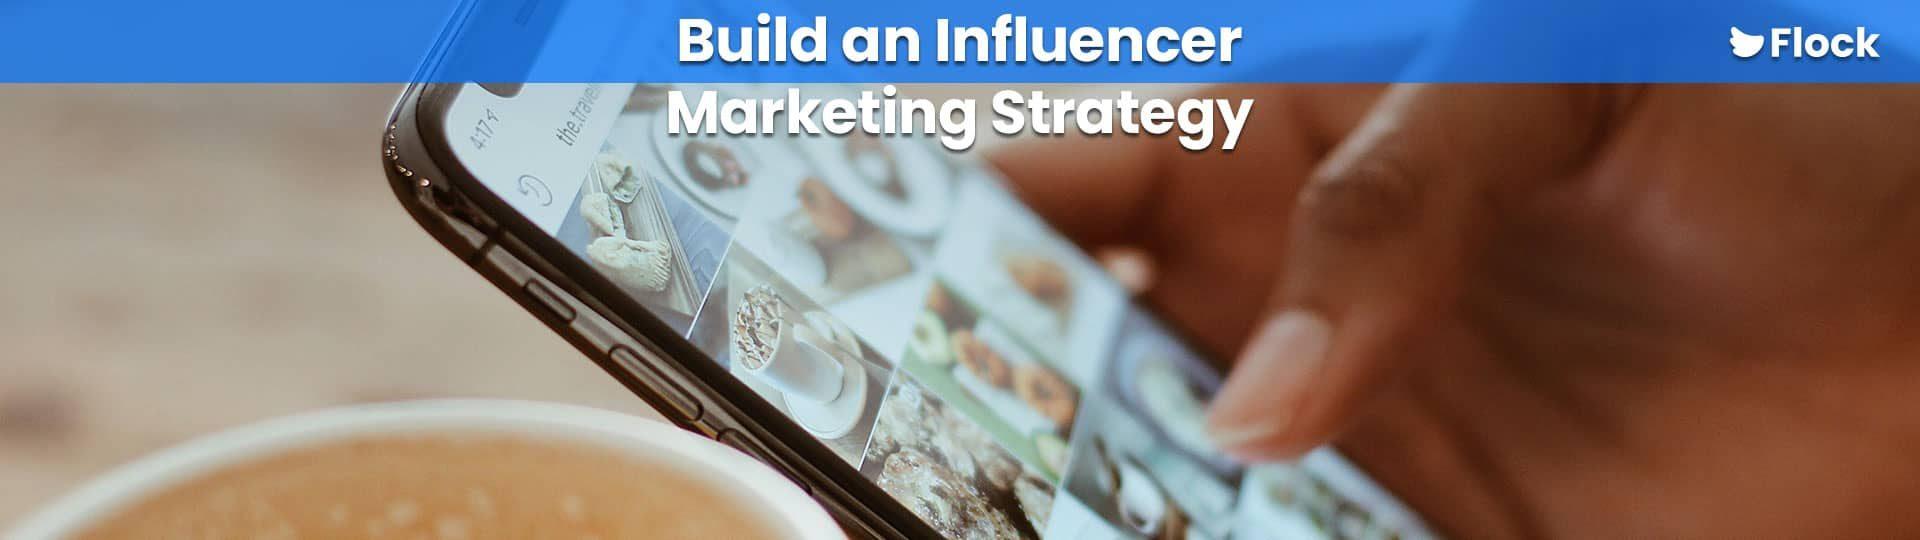 Build-an-Influencer-Marketing-Strategy